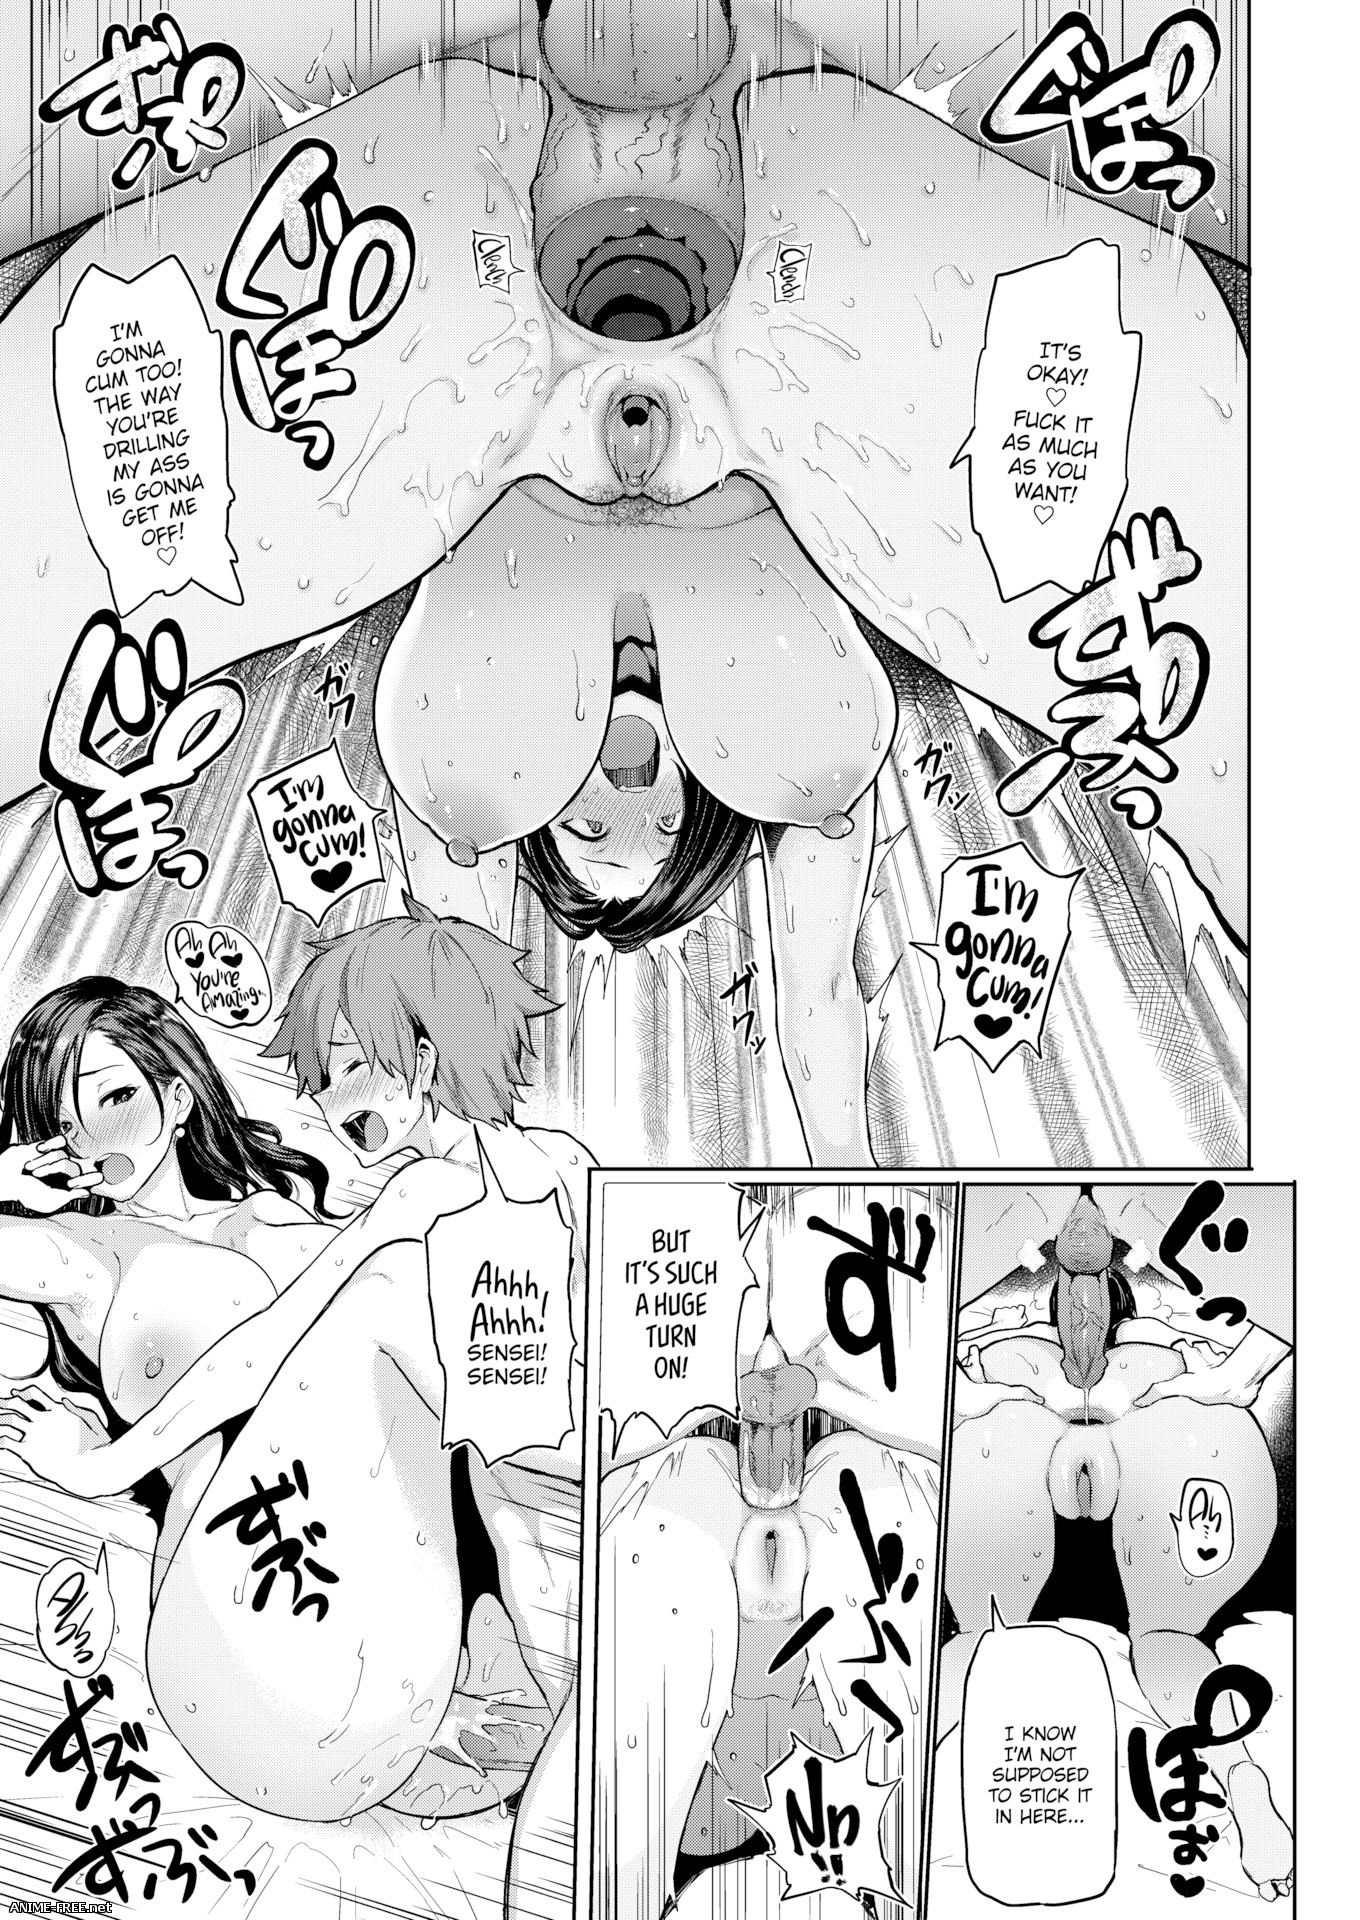 Fakku (Collection) - Сборник хентай манги [Uncen] [ENG] Manga Hentai